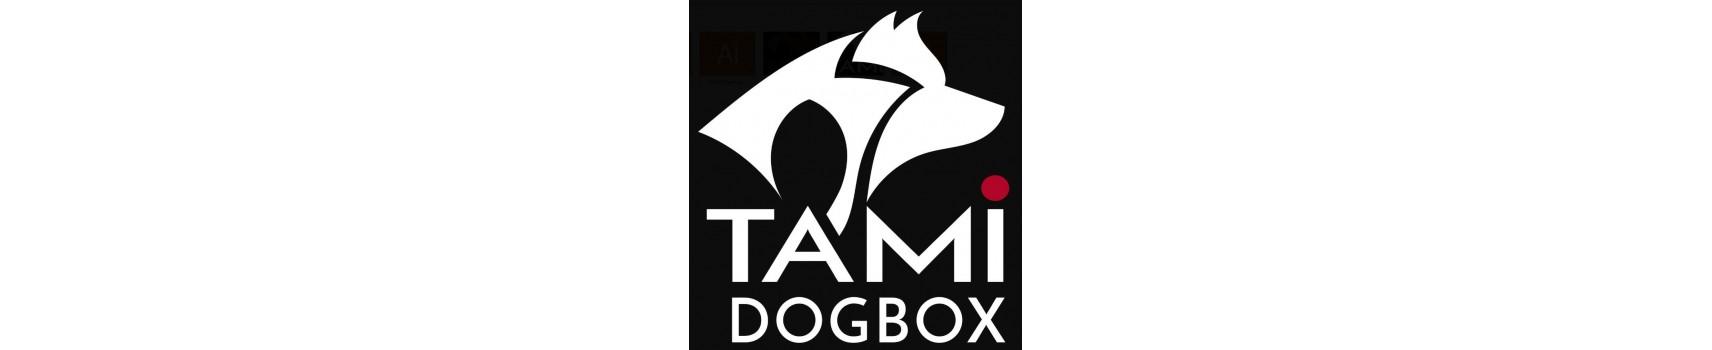 Tami - Hundebox